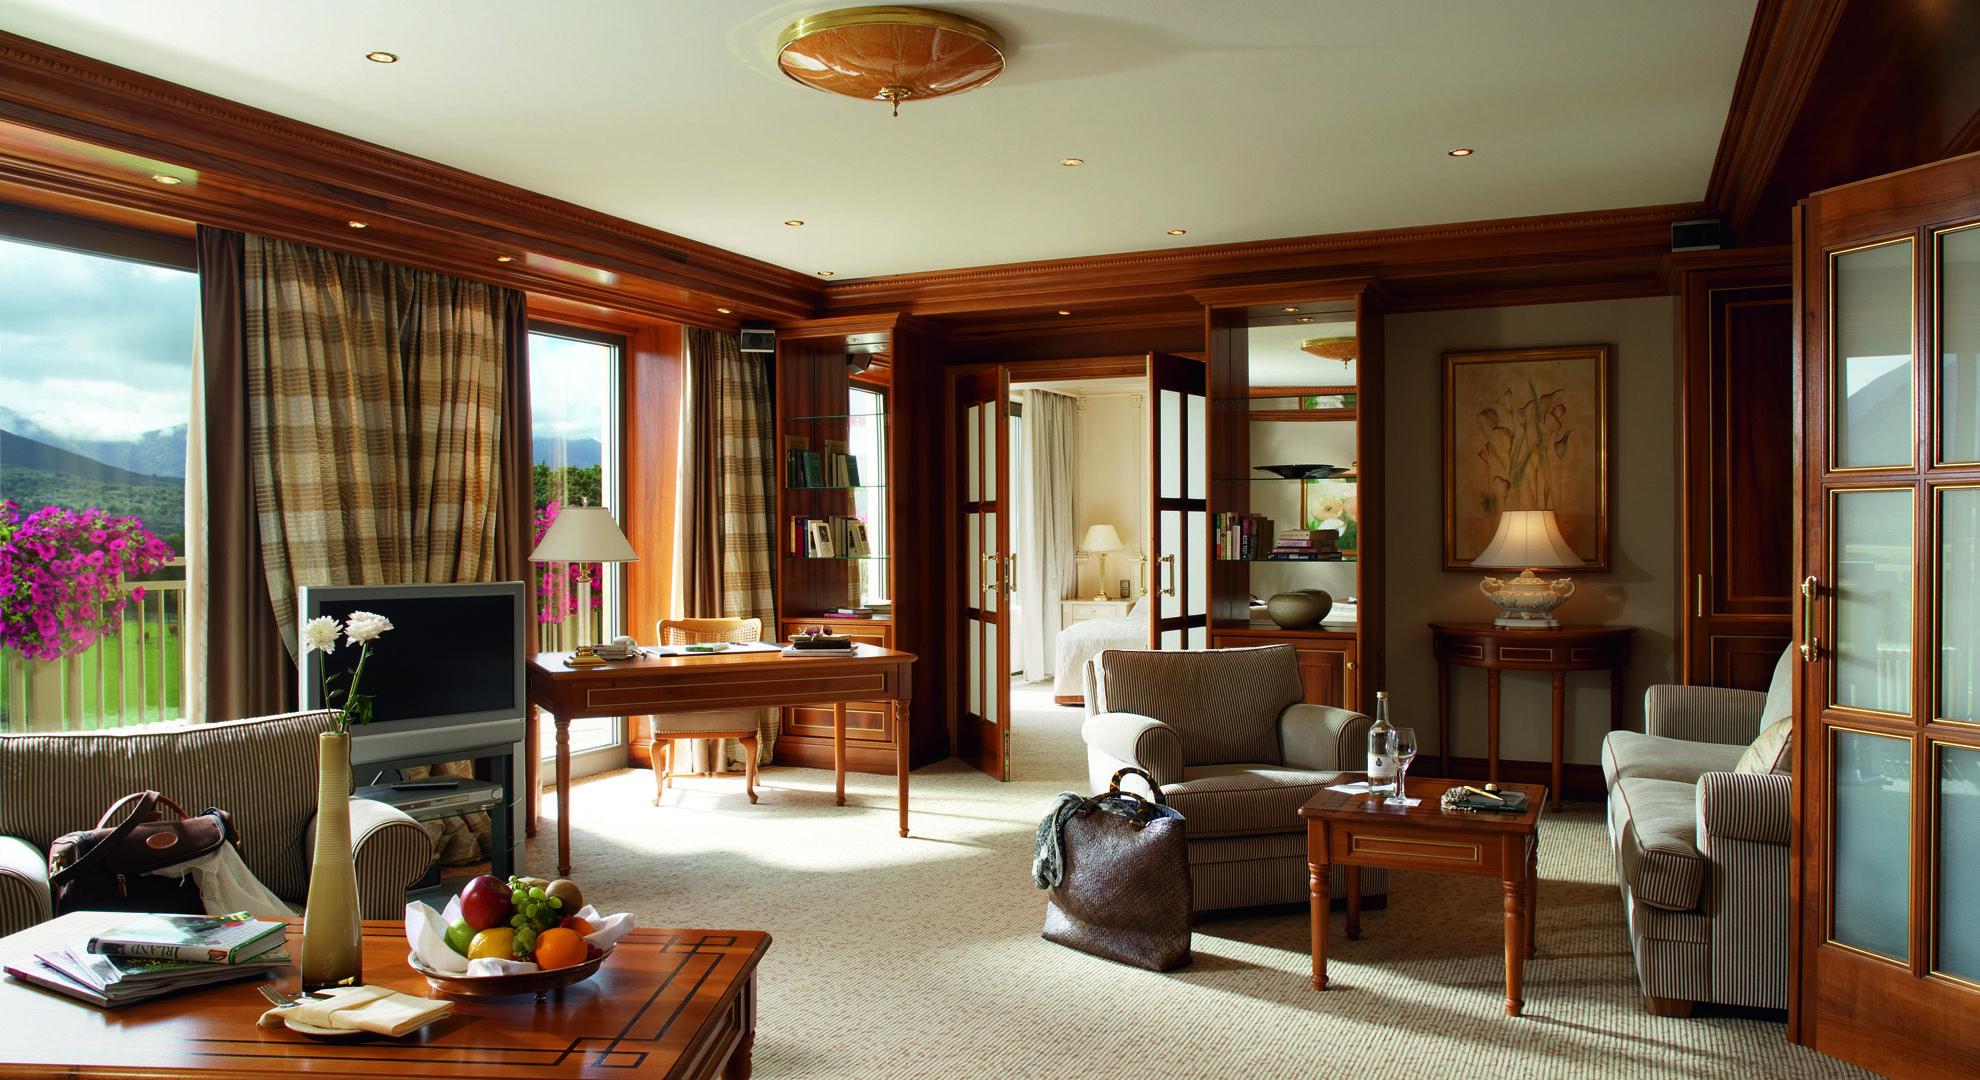 5 Star Hotel Accommodation Kerry Killarney Hotels In Ireland Dunloe Castle Co